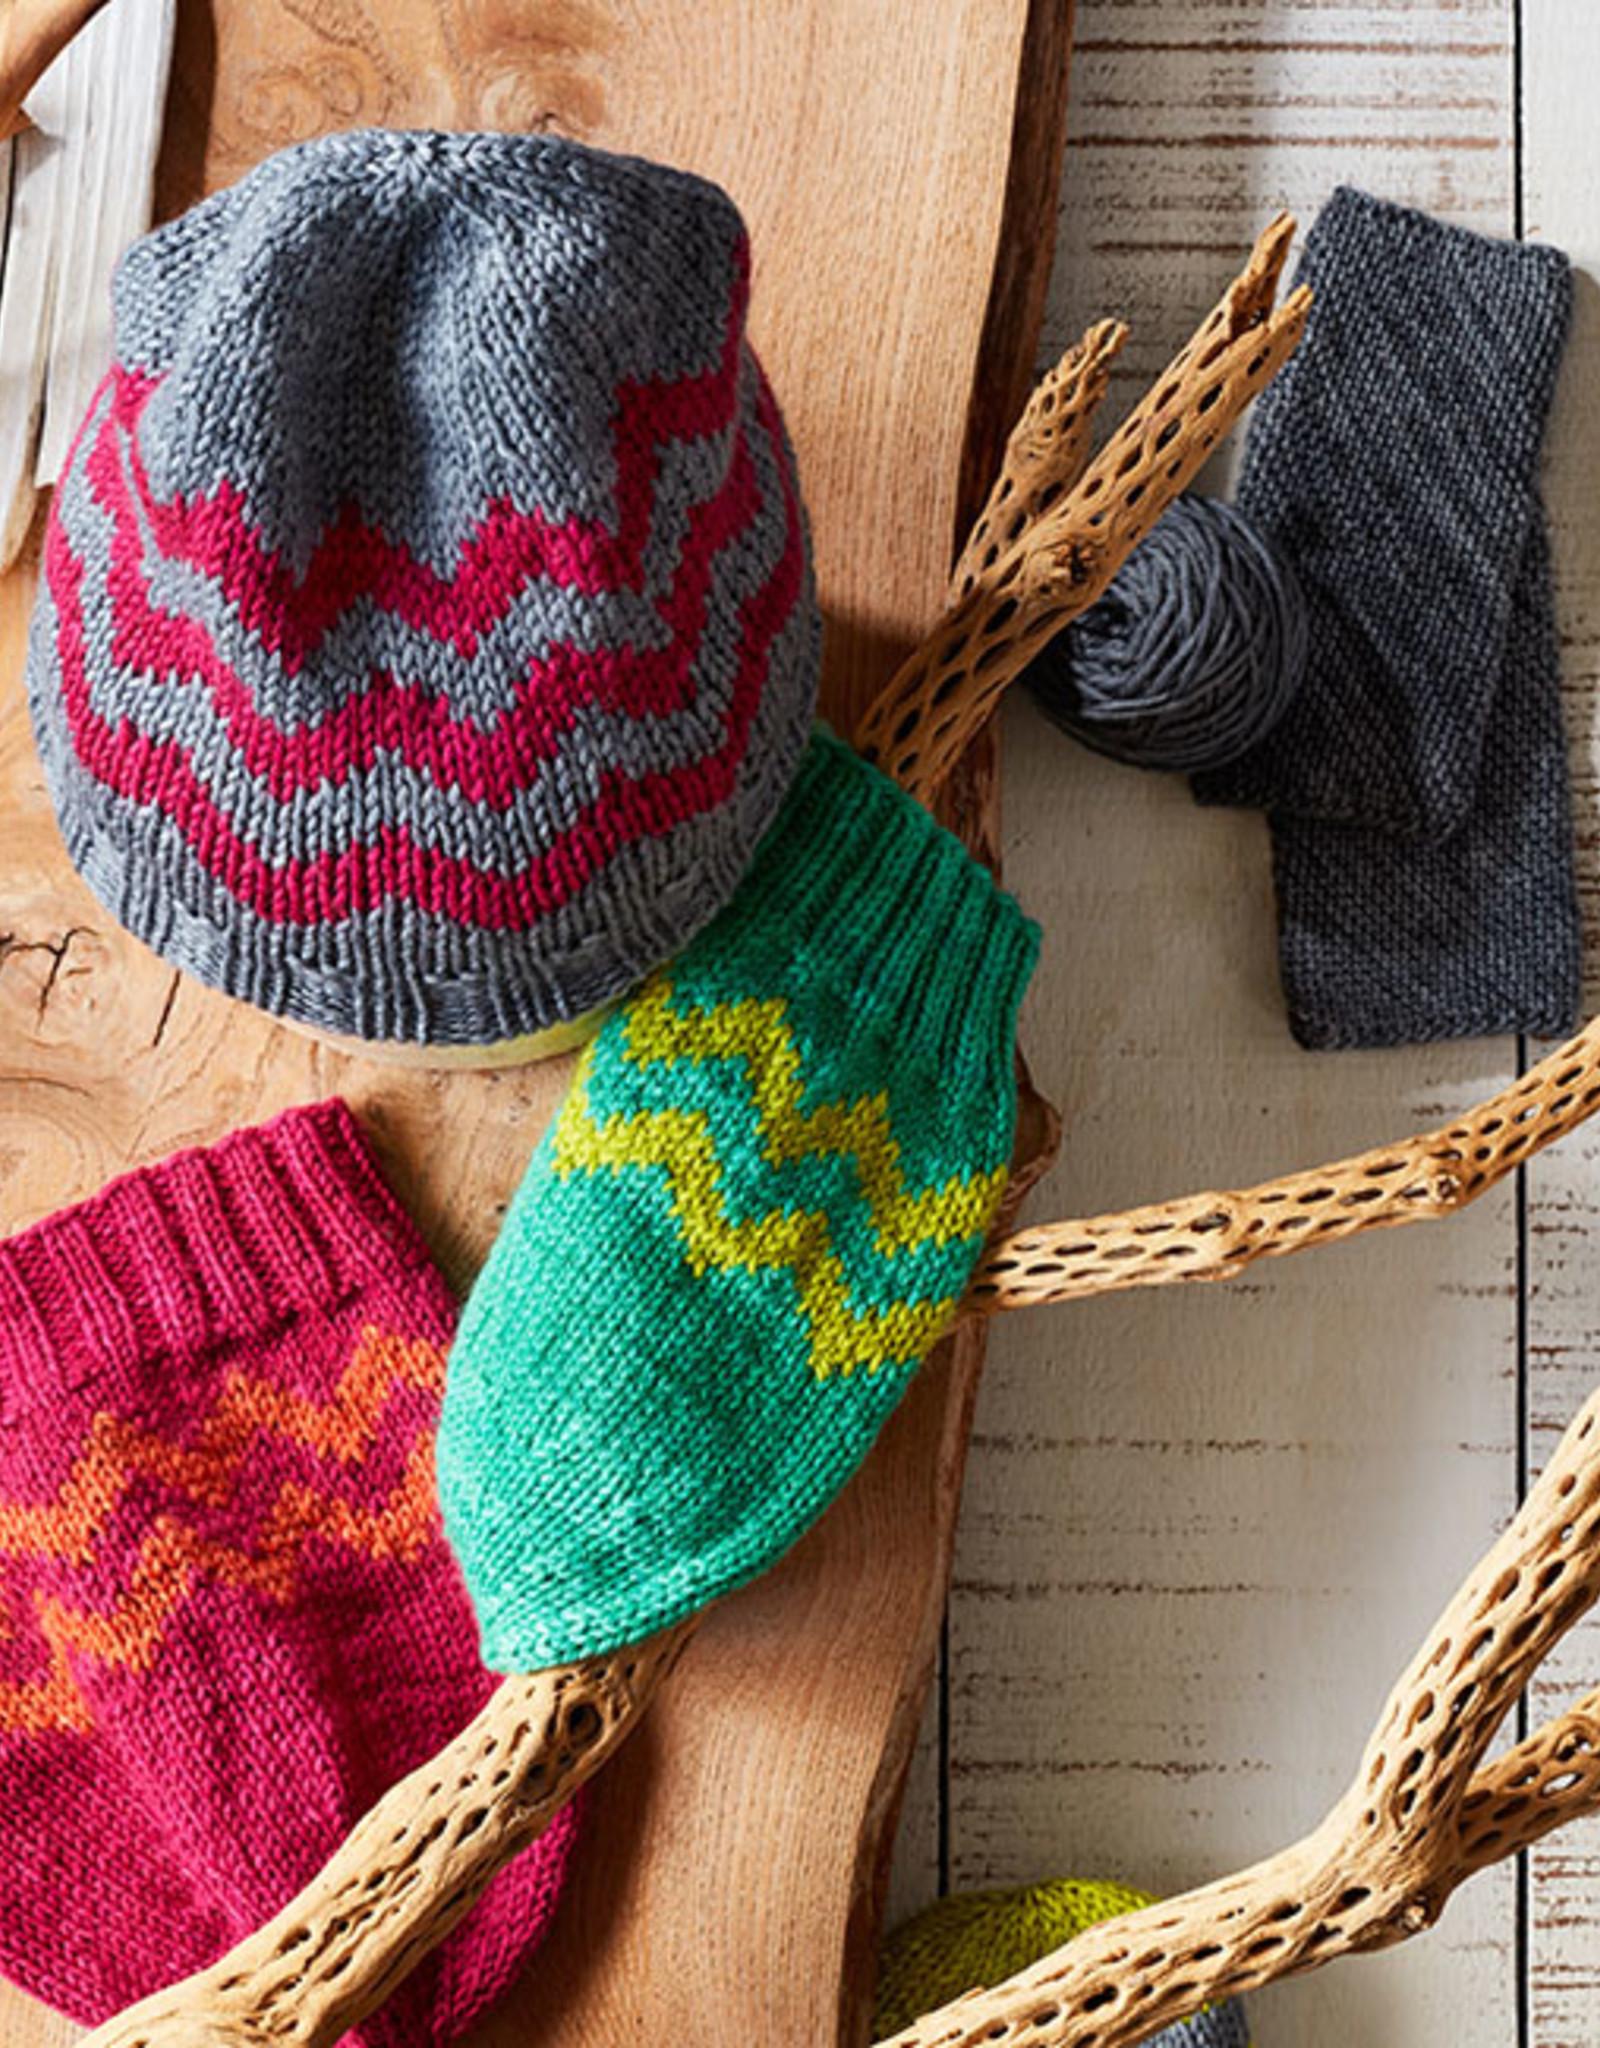 Modern Daily Knitting Modern Daily Knitting Field Guide No. 18: Beginnings